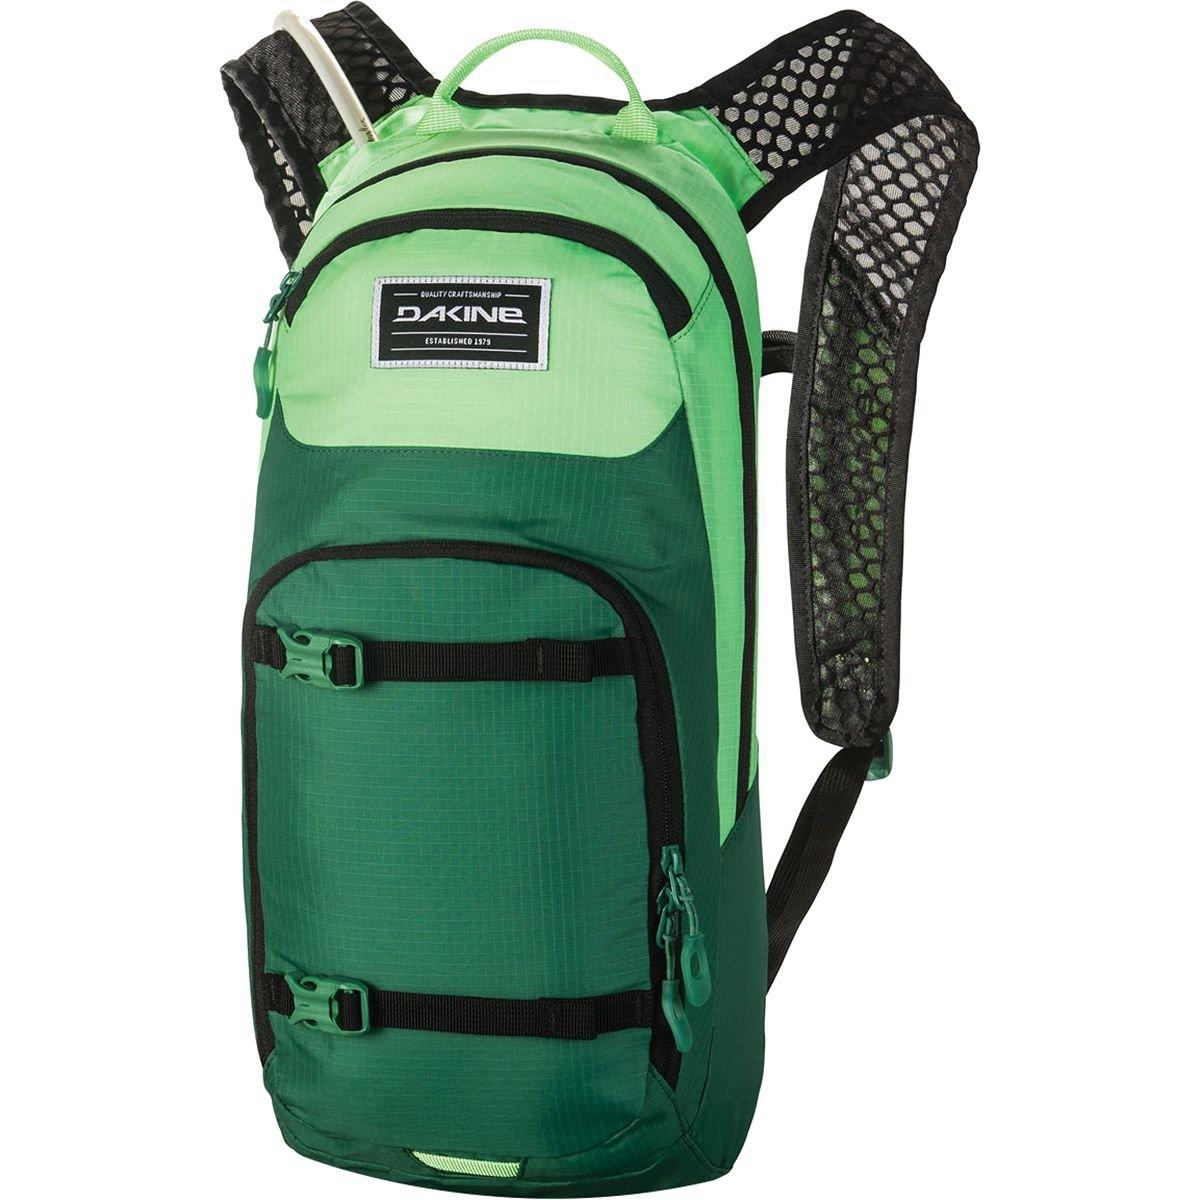 Dakine Session 8L Backpack Summer Green/Fir, One Size